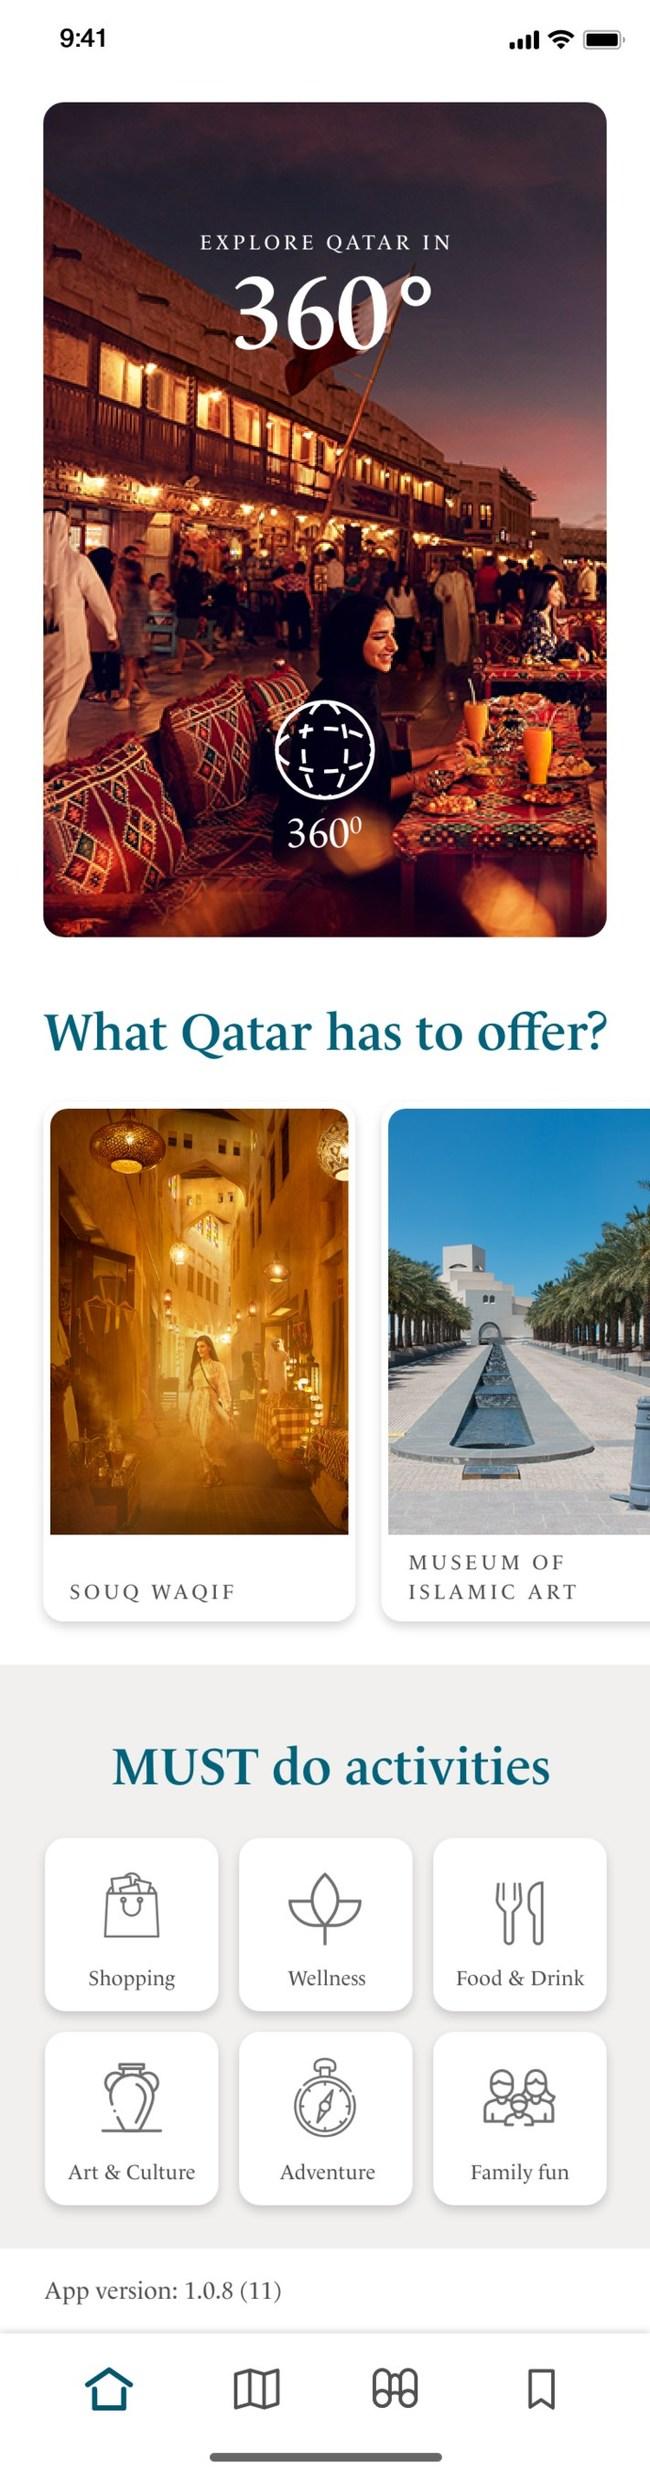 Qatar National Tourism Council (PRNewsfoto/Qatar National Tourism Council)